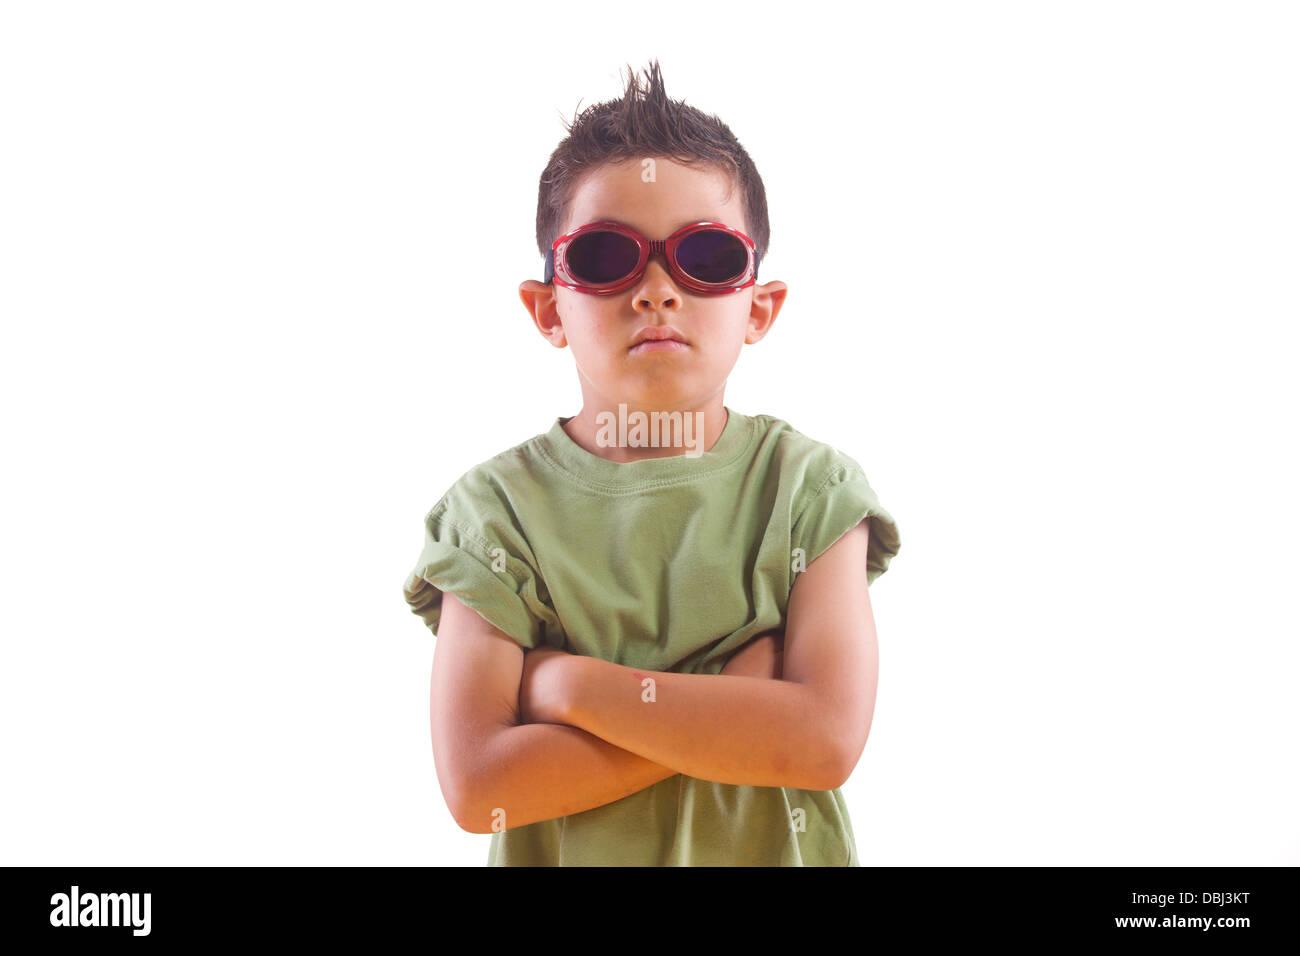 Tough boy wearing goggles. - Stock Image